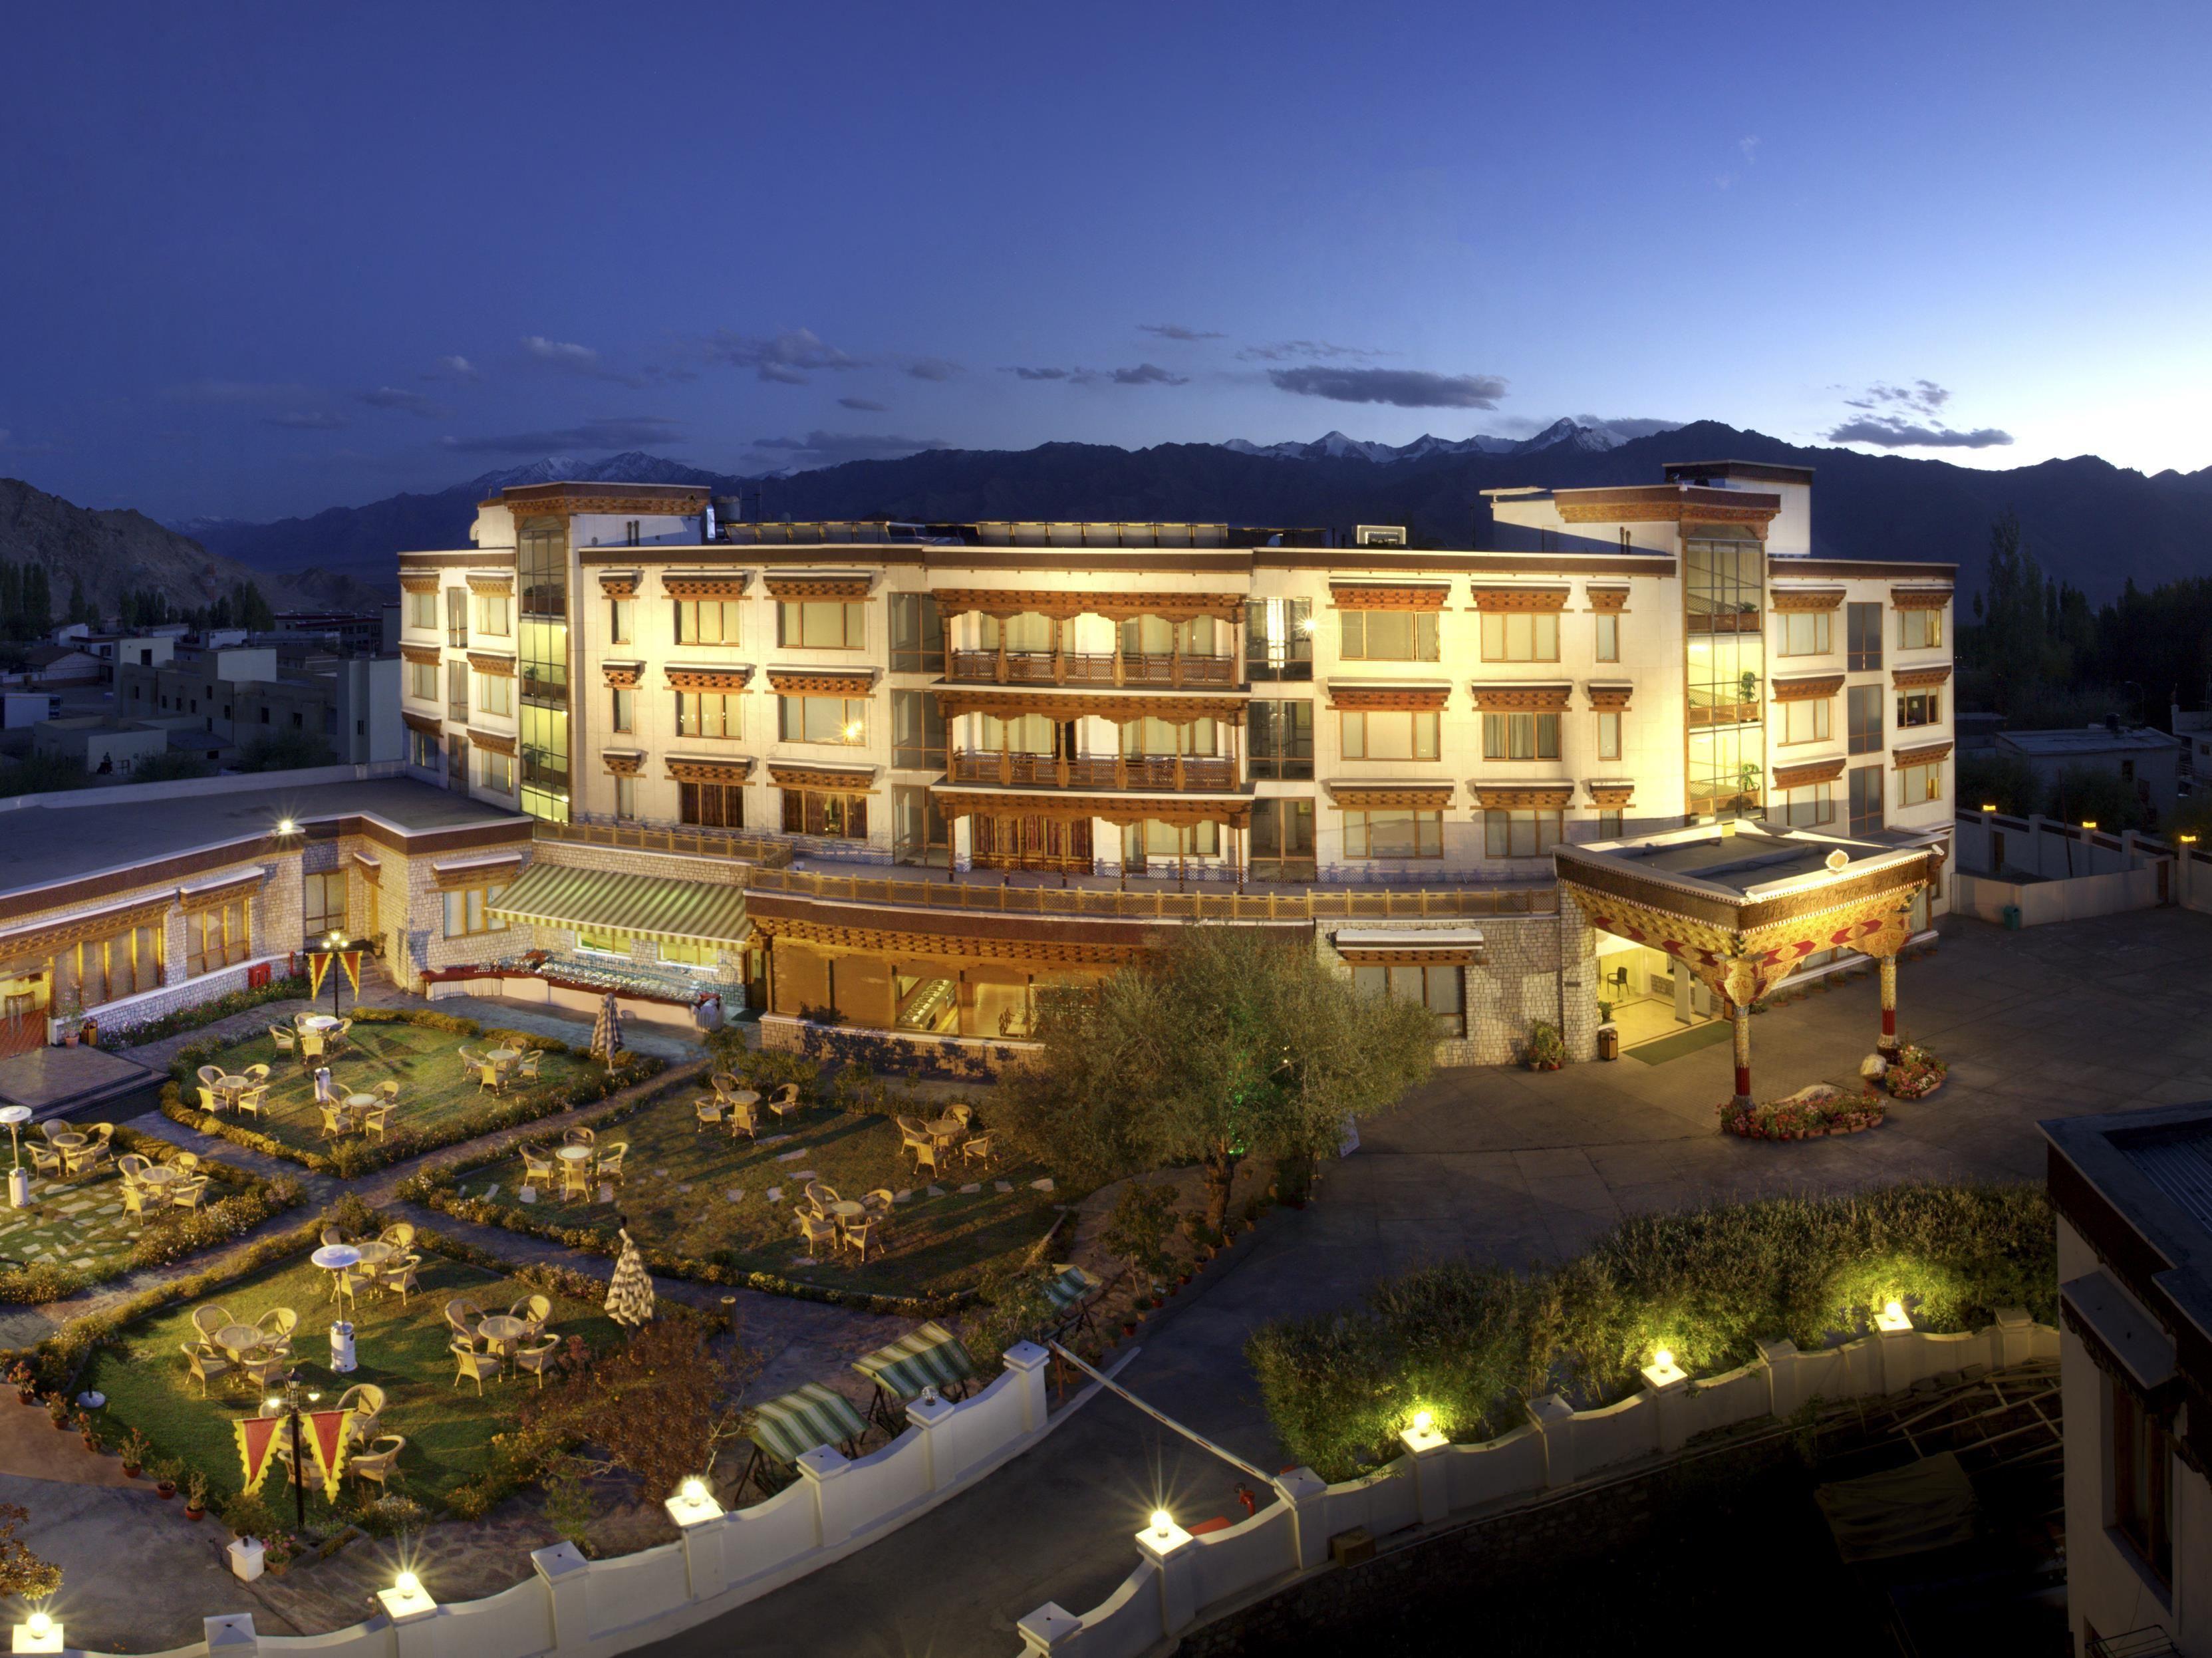 Leh The Grand Dragon Hotel India, Asia The Grand Dragon